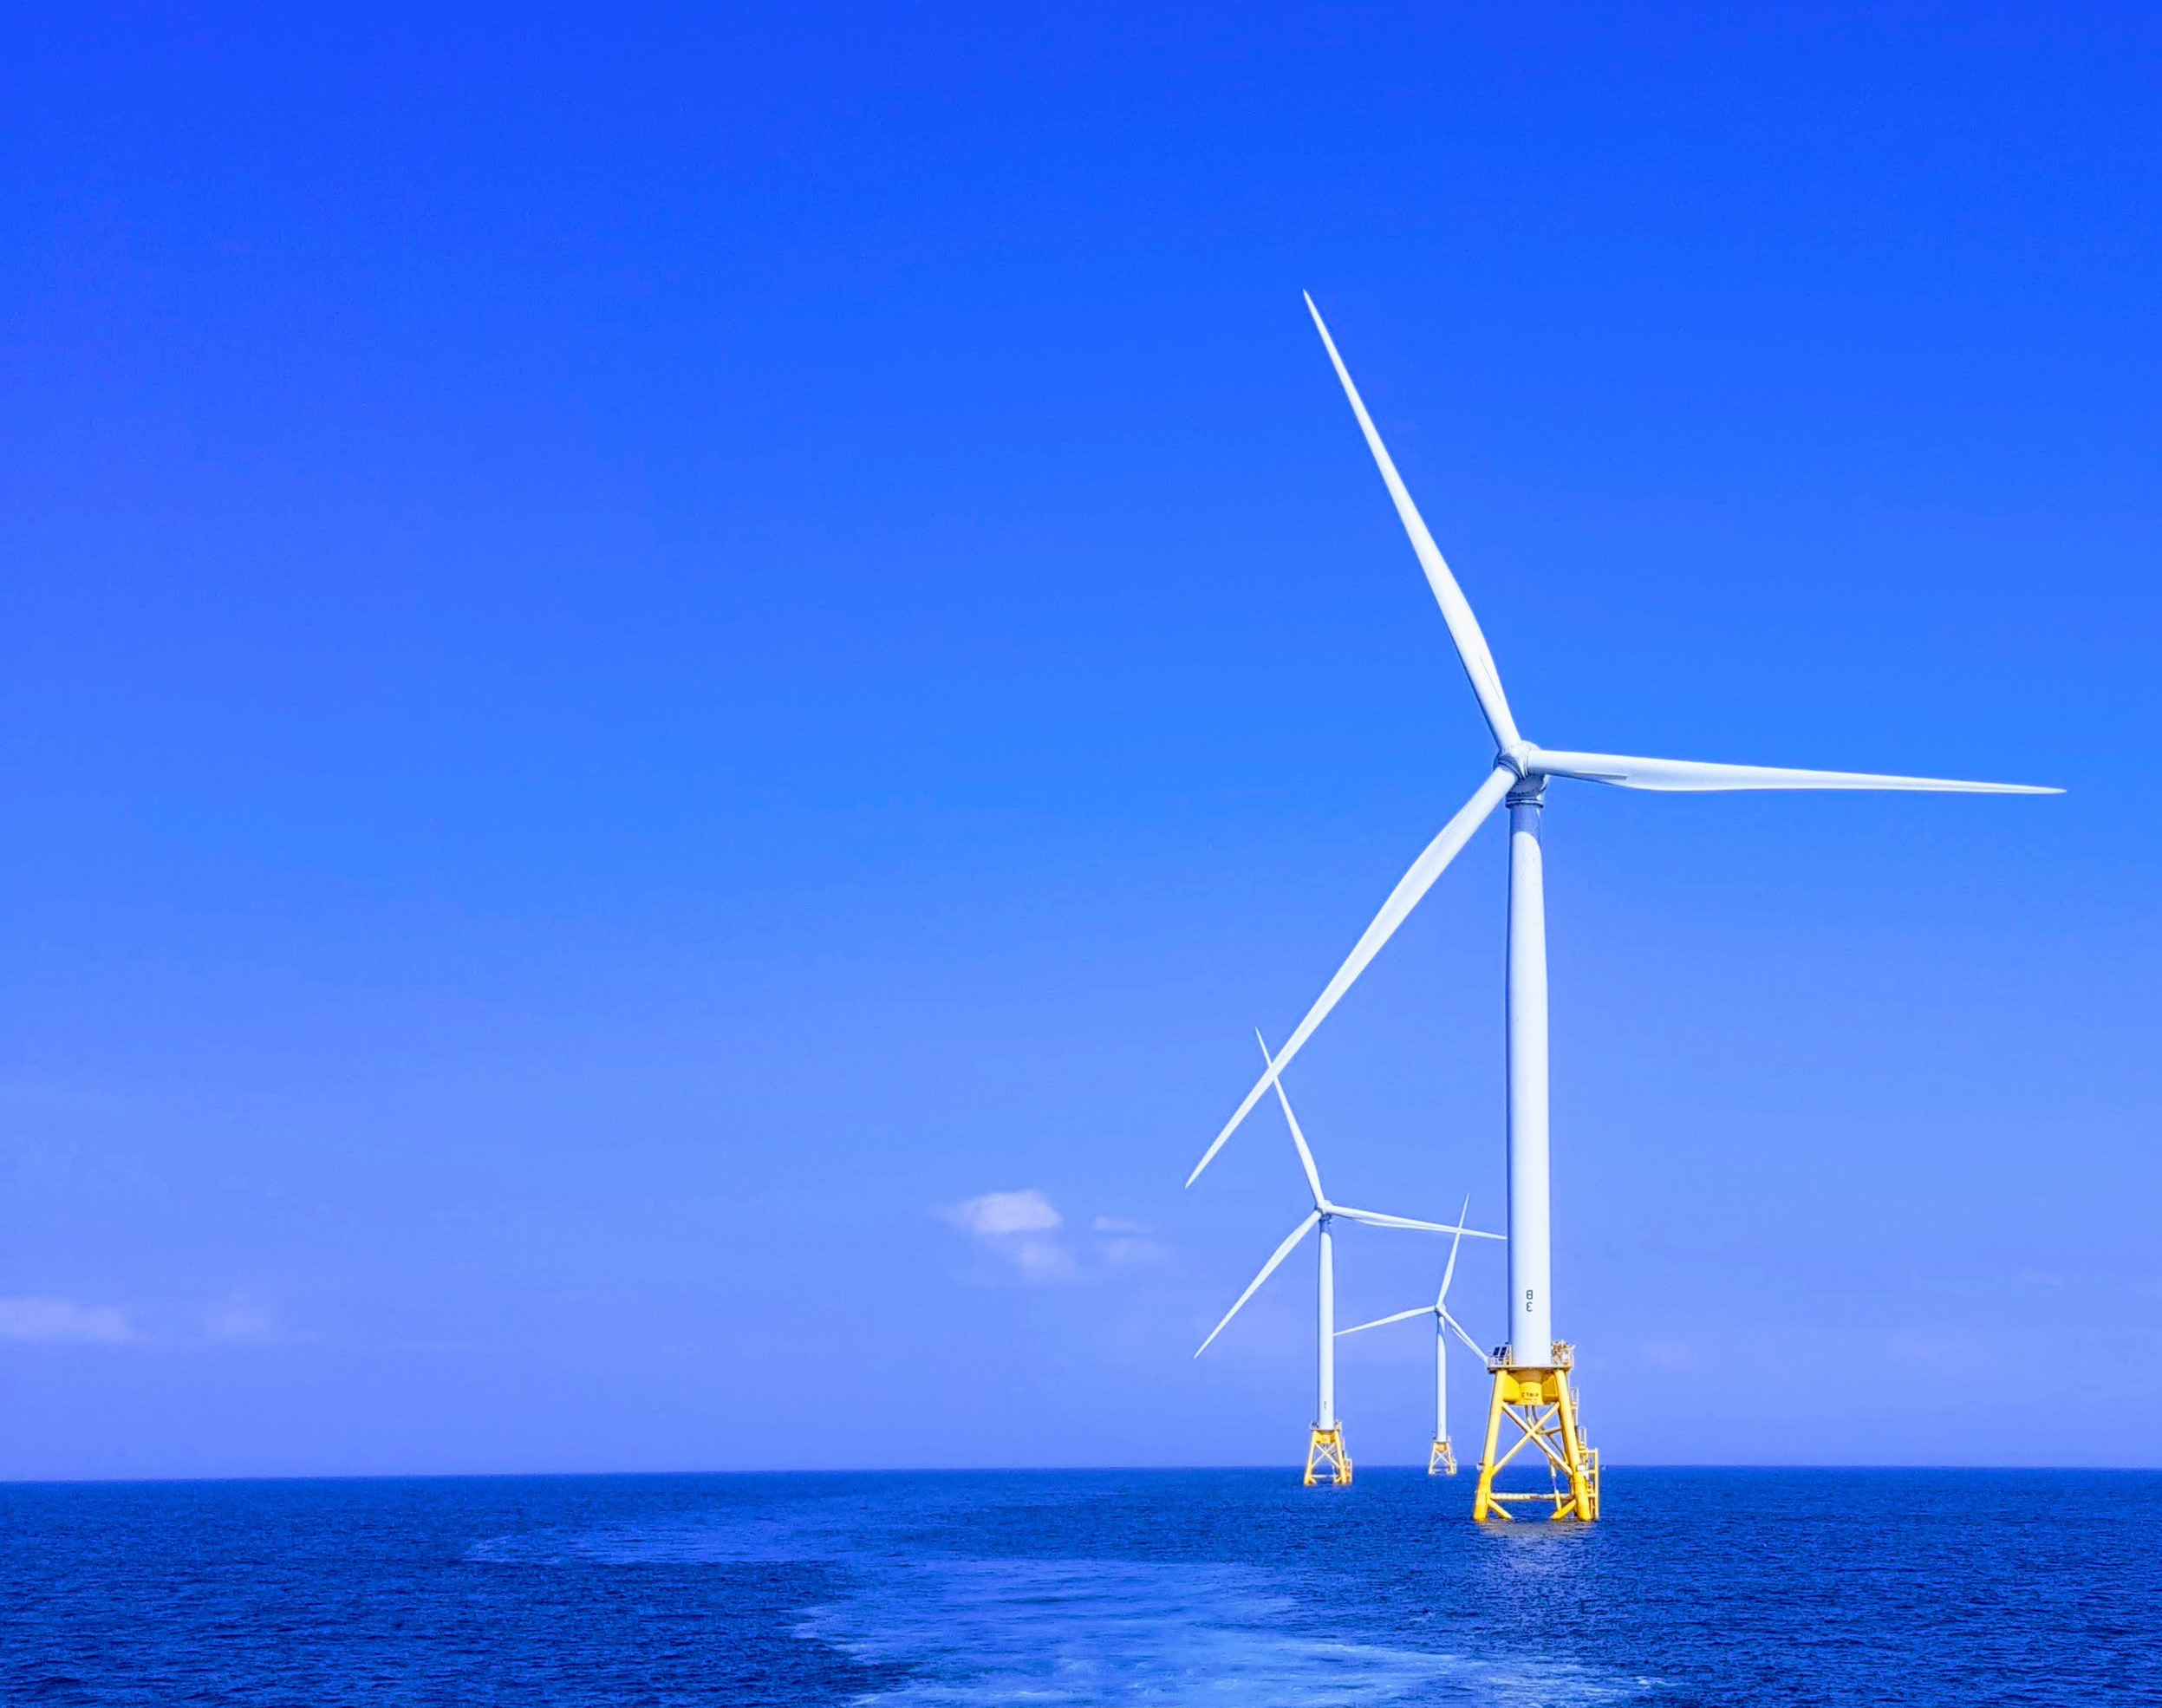 Mayflower Wind Bid Utilizes Transmission Assets Developed by Anbaric